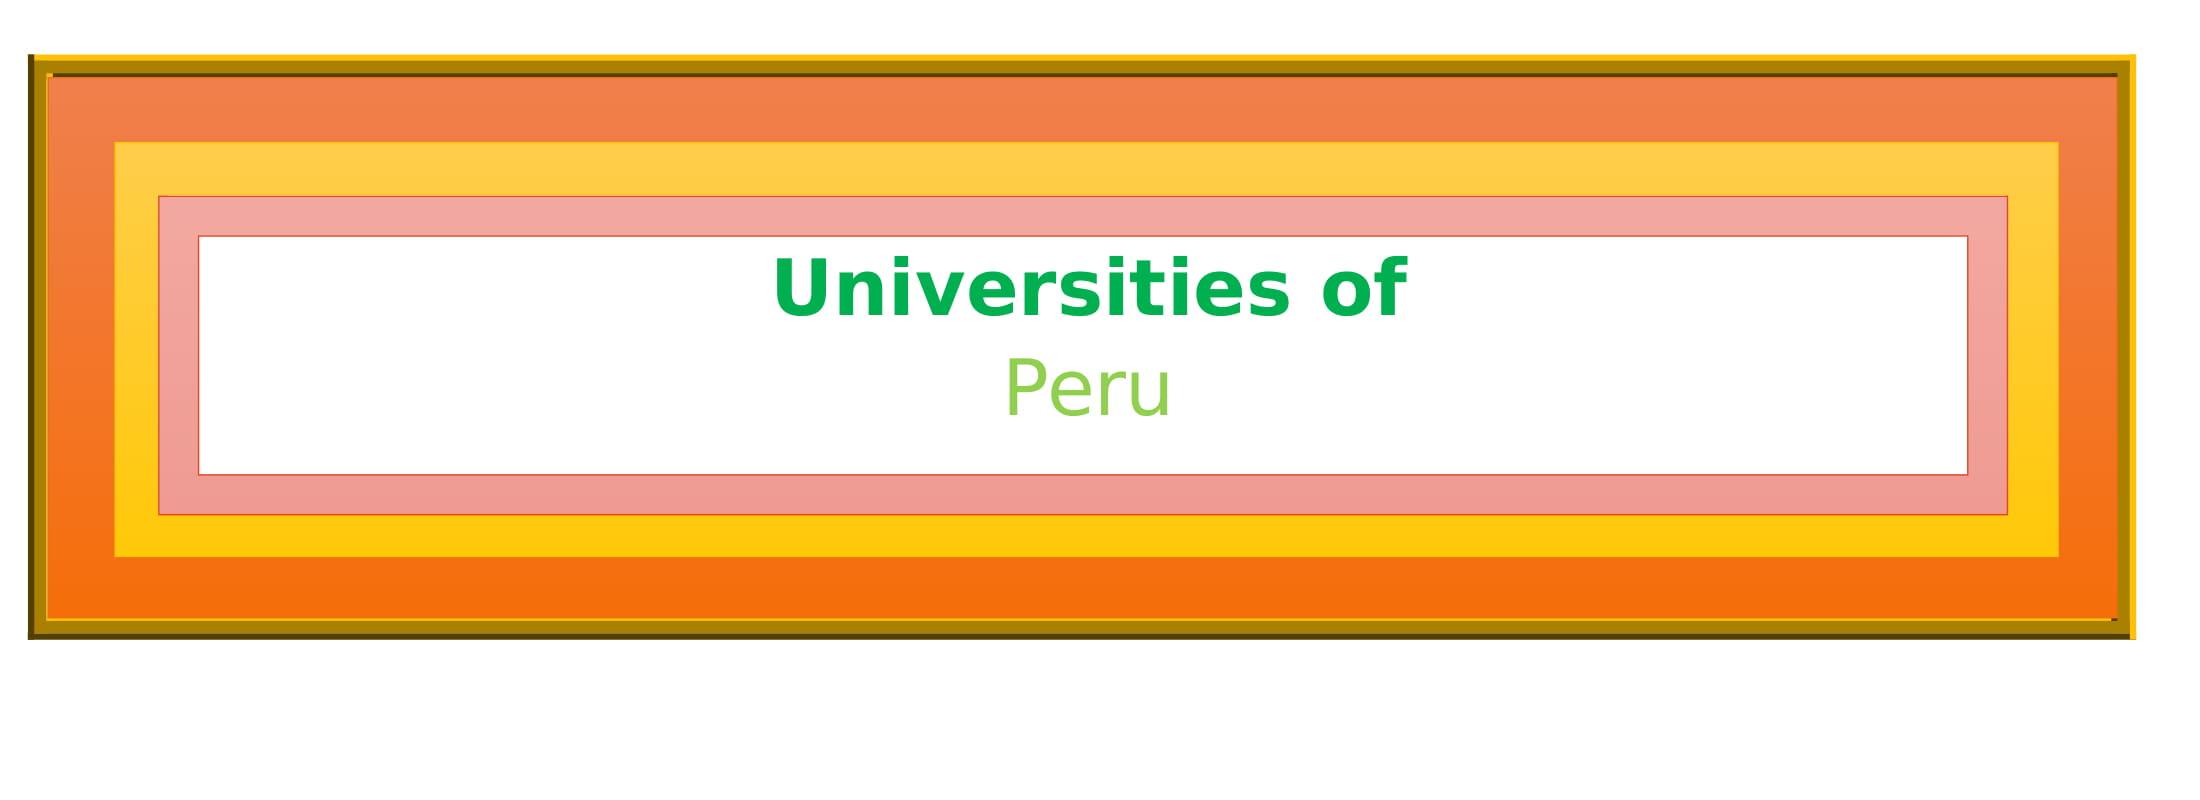 List of Universities in Peru